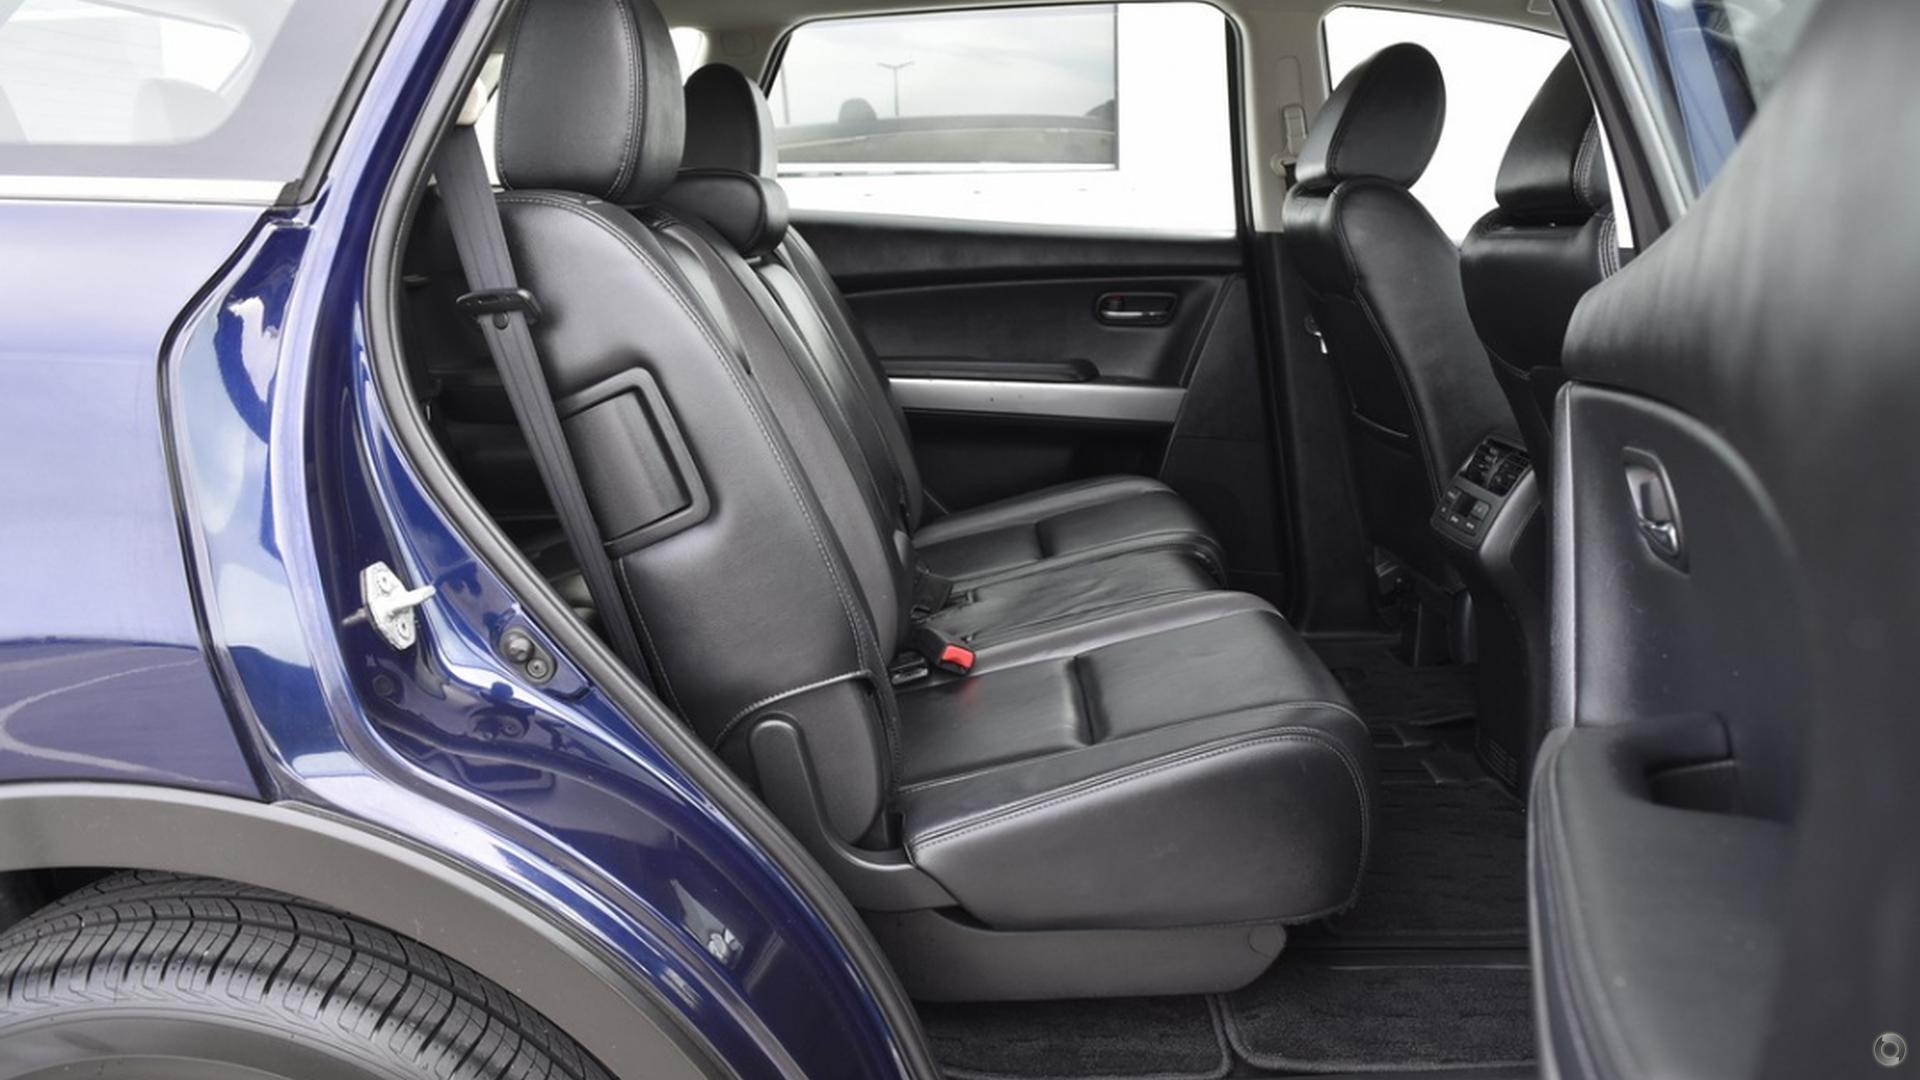 2012 Mazda Cx-9 Grand Touring TB Series 4